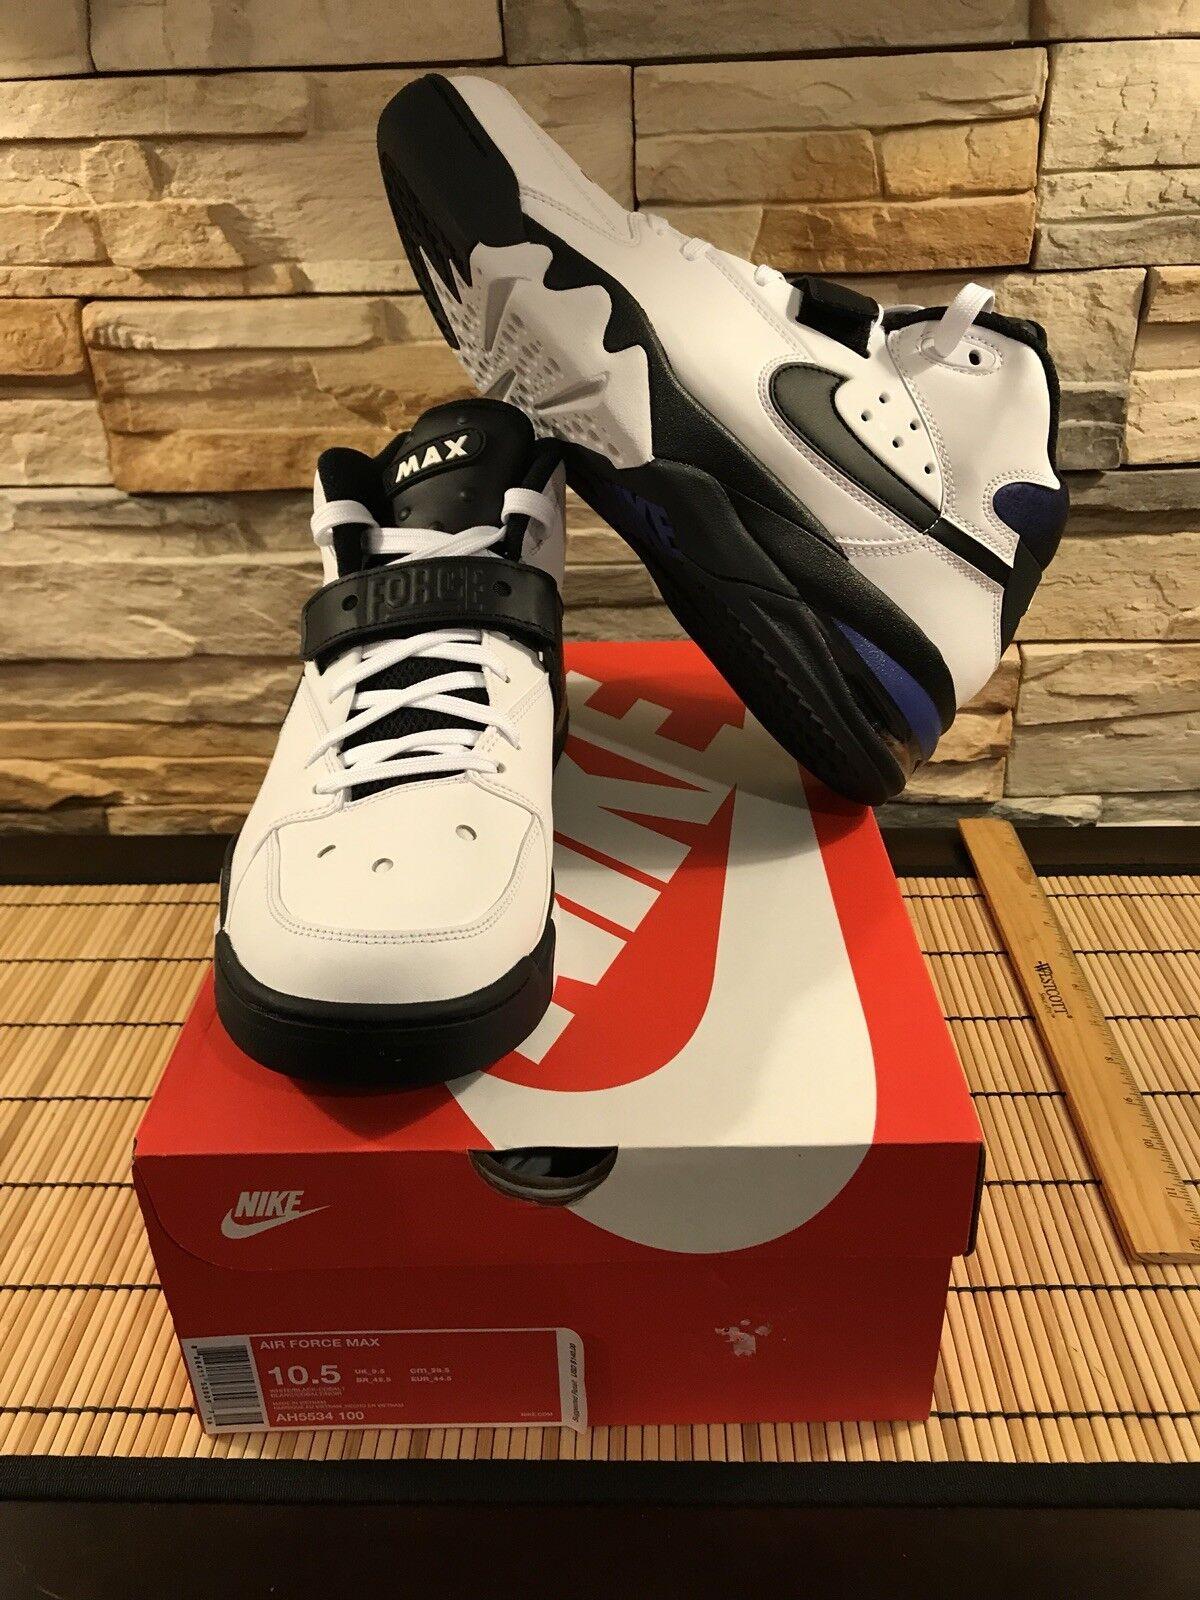 Nike Air Force 93 Max 93 Force Basketball Shoes Men's Sz 10.5 AH5534 100 1f863c